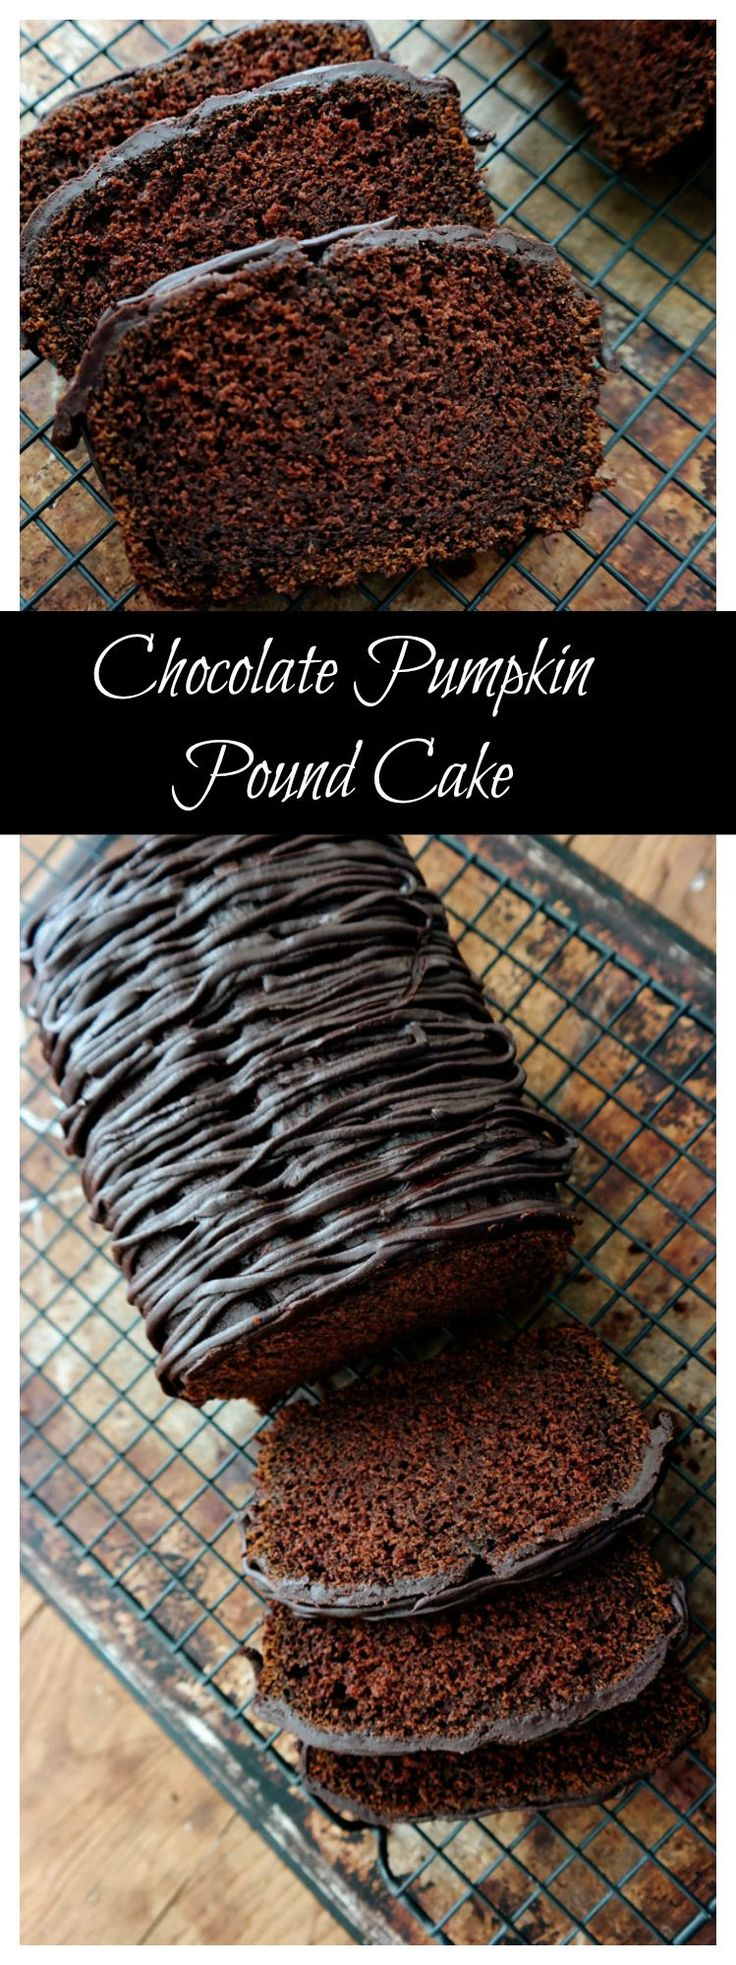 Chocolate Pumpkin Pound Cake recipe-rich, moist with just a subtle hint of pumpkin flavor, then drizzled with dark chocolate ganache!